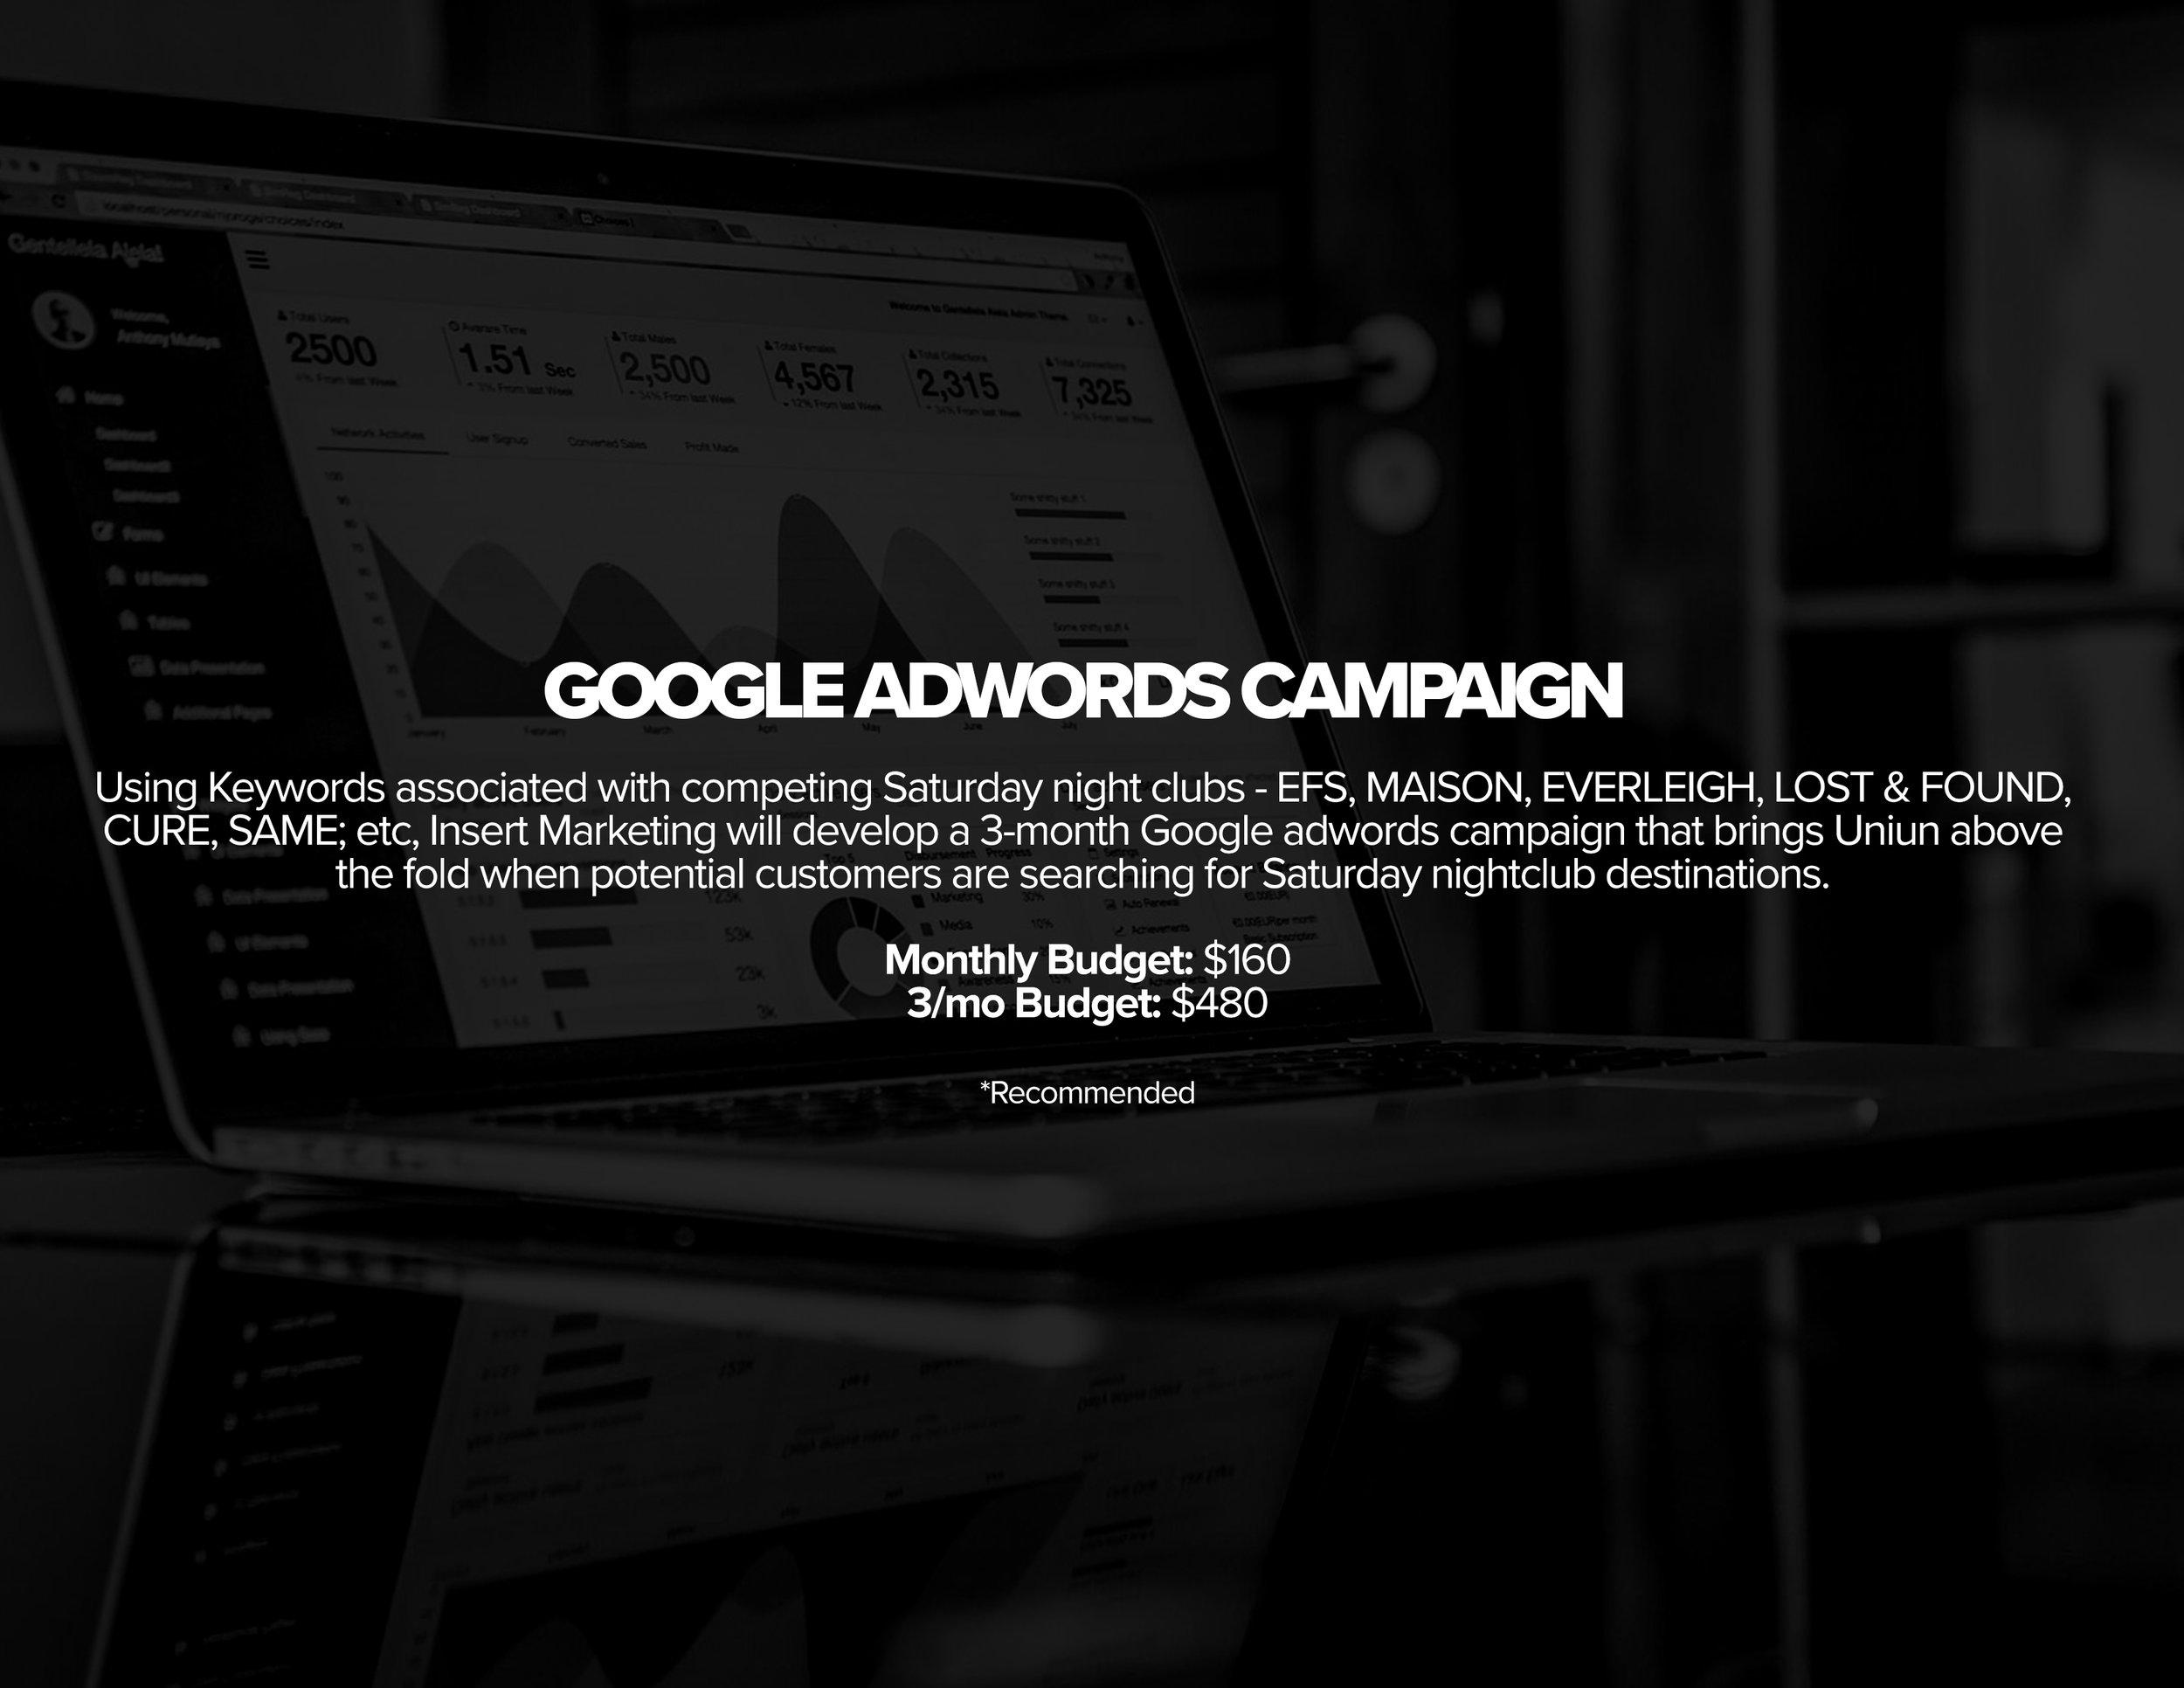 GoogleAdWordsCampaign_8.5x11.jpg